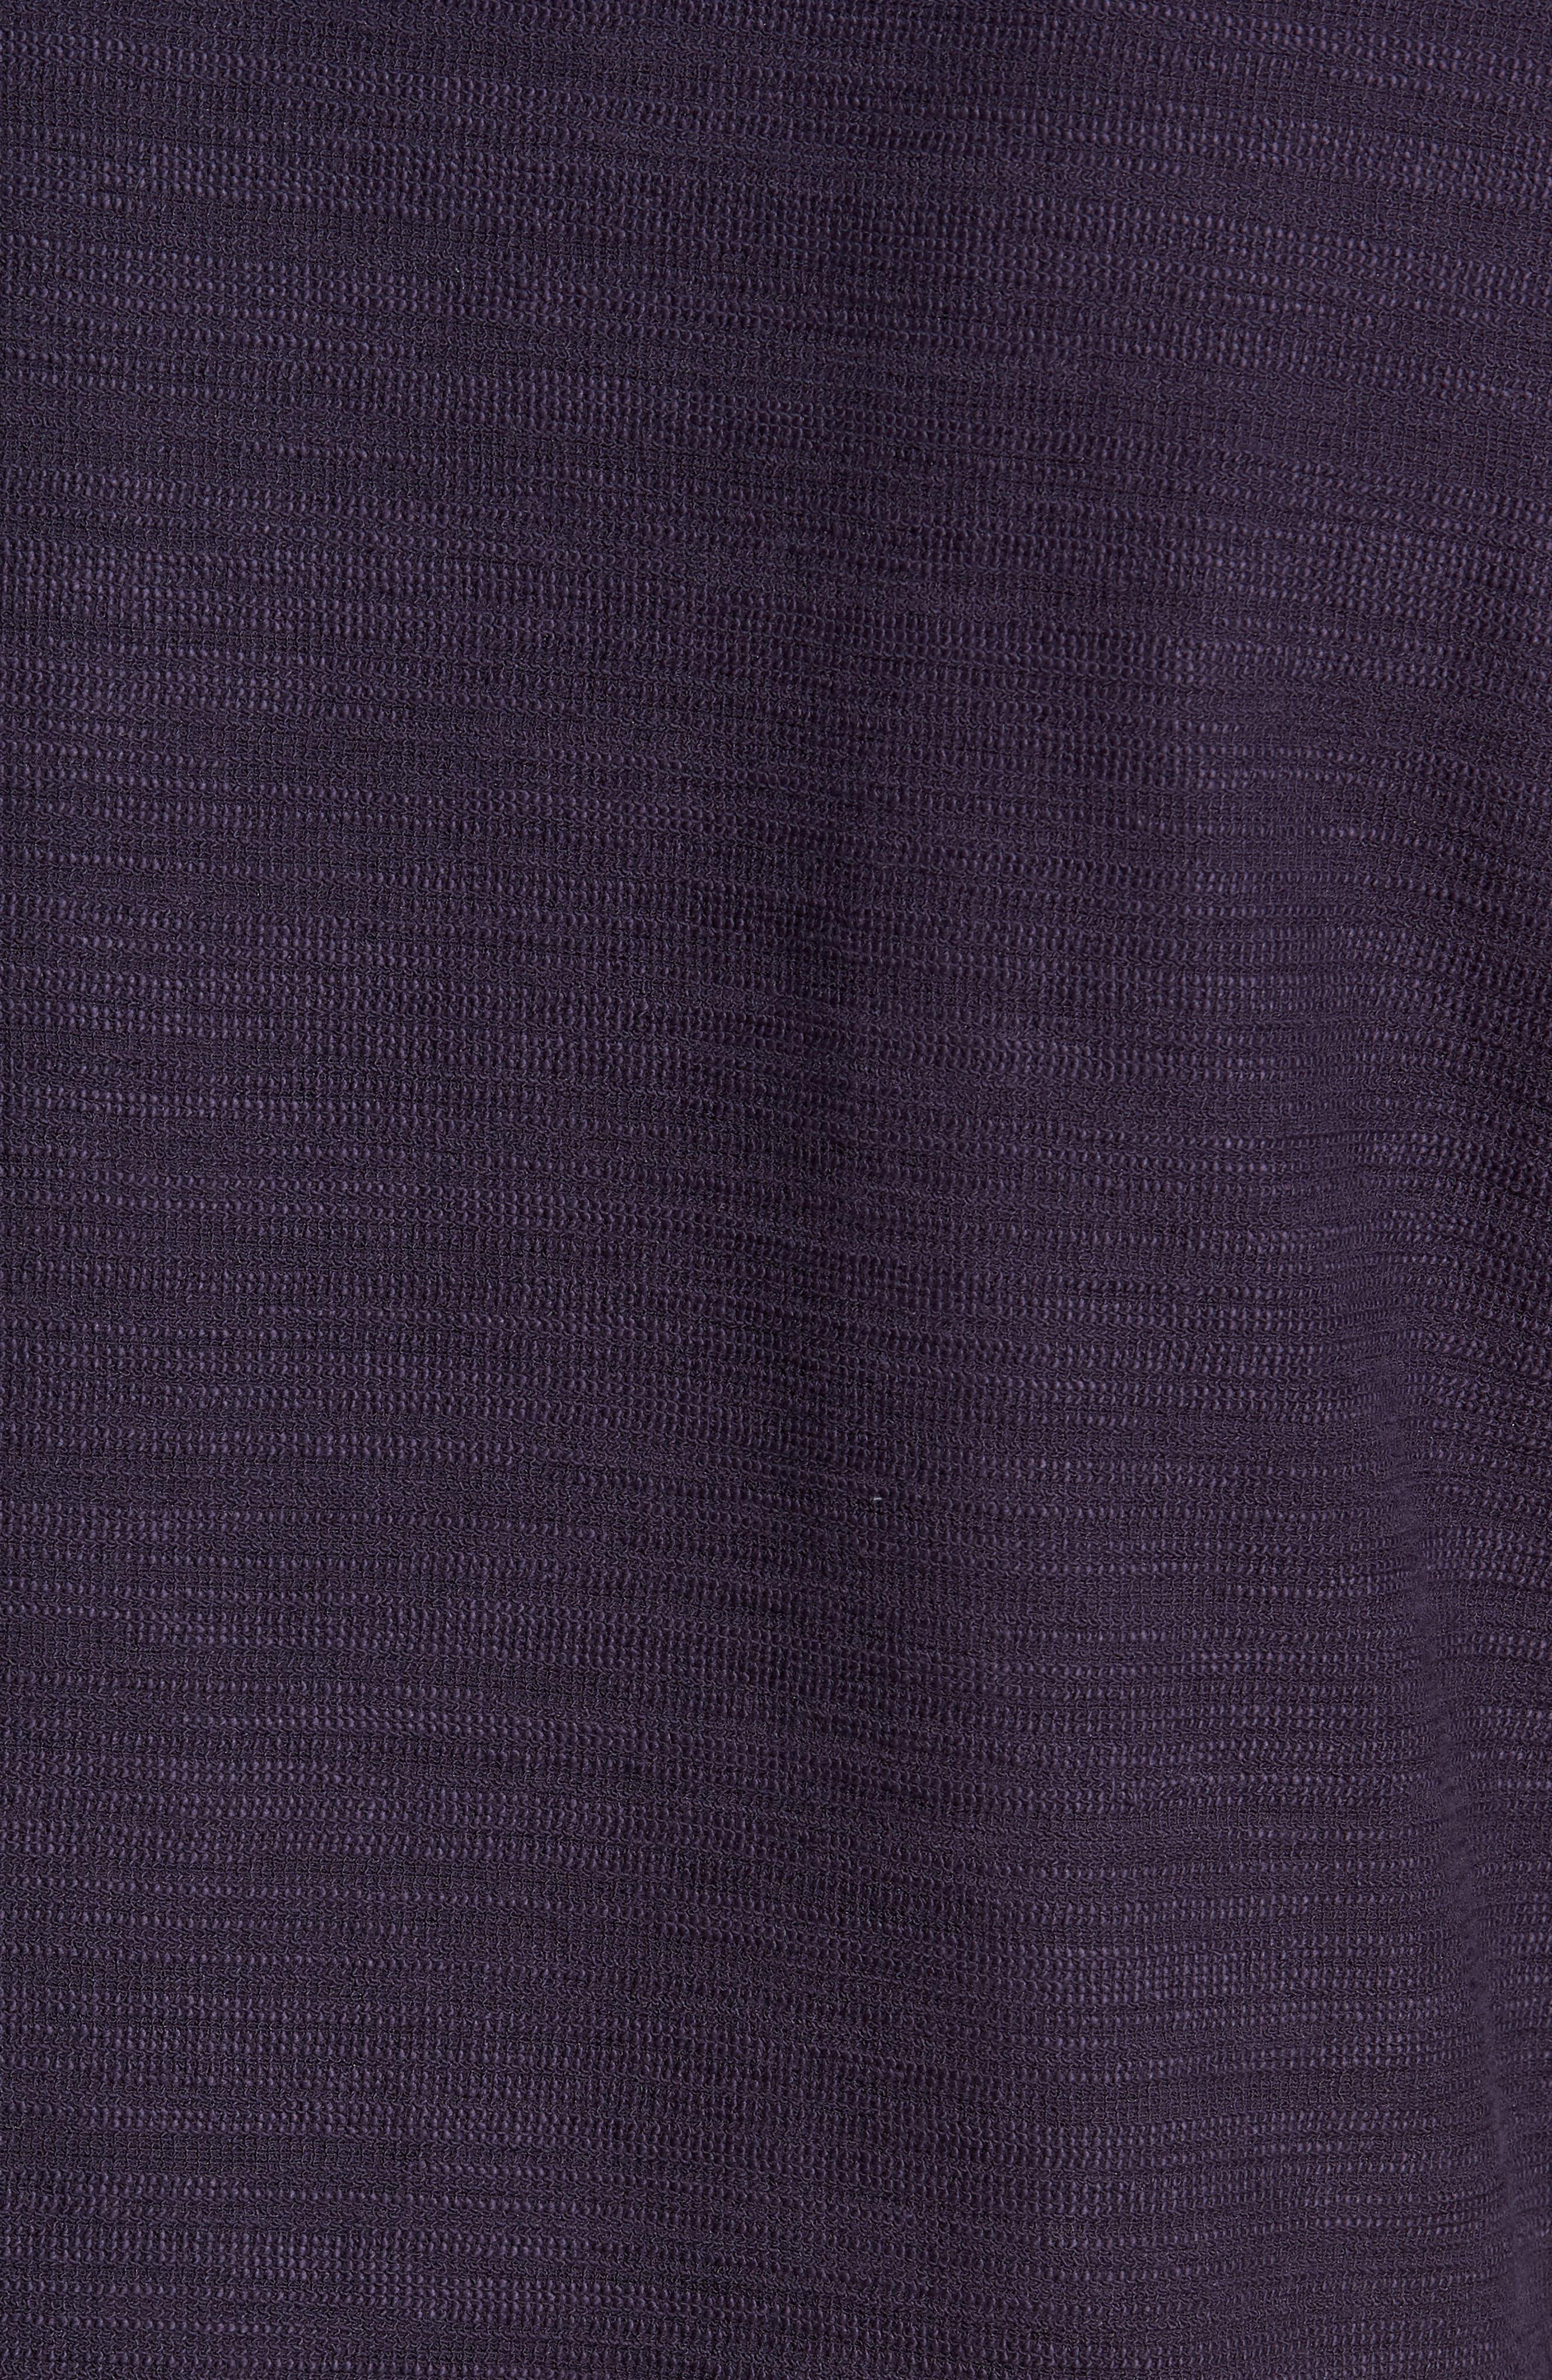 250 Loft Slubbed Crewneck Sweater,                             Alternate thumbnail 5, color,                             NAVY